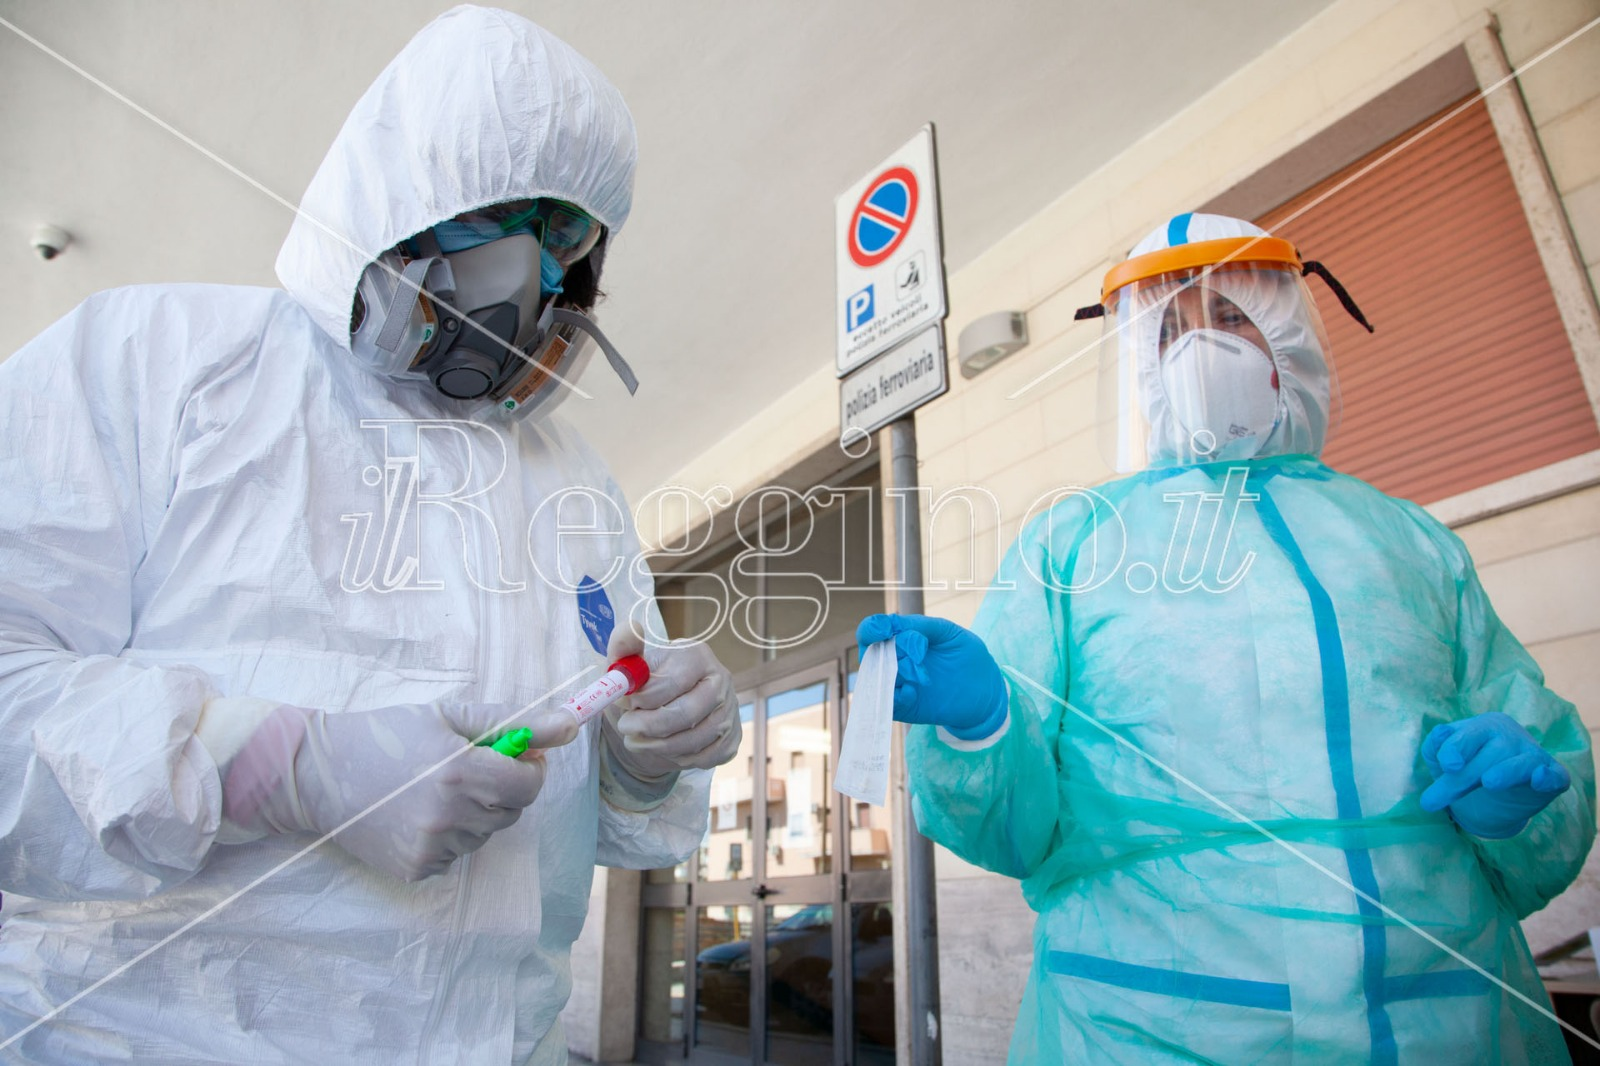 Coronavirus Reggio Calabria, 15 nuovi casi positivi